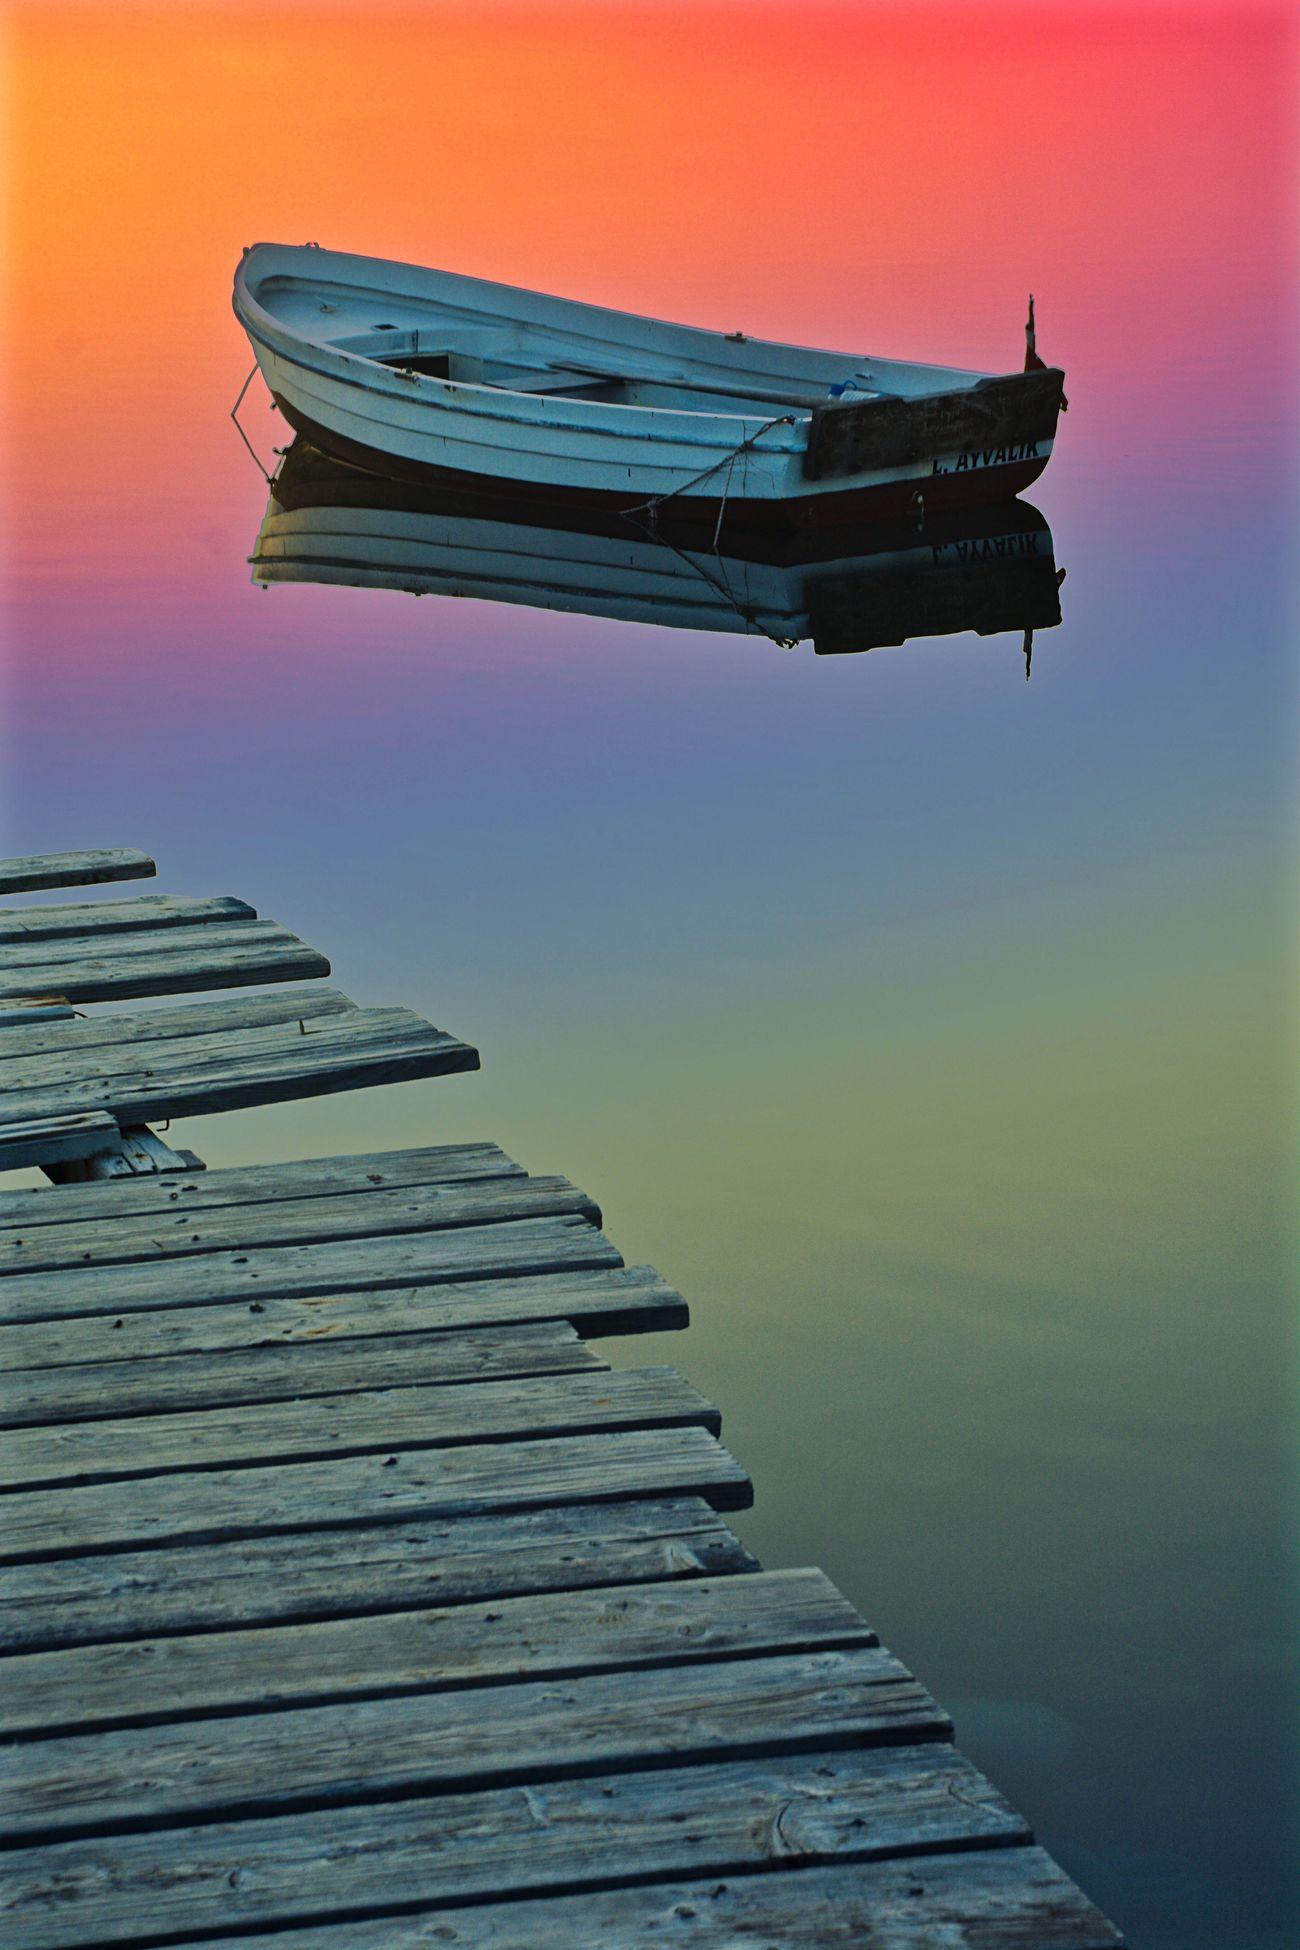 Phosphorescence Phosphorescence In The Sea. Boats Boat Pier Summer Summertime First Eyeem Photo EyeEm